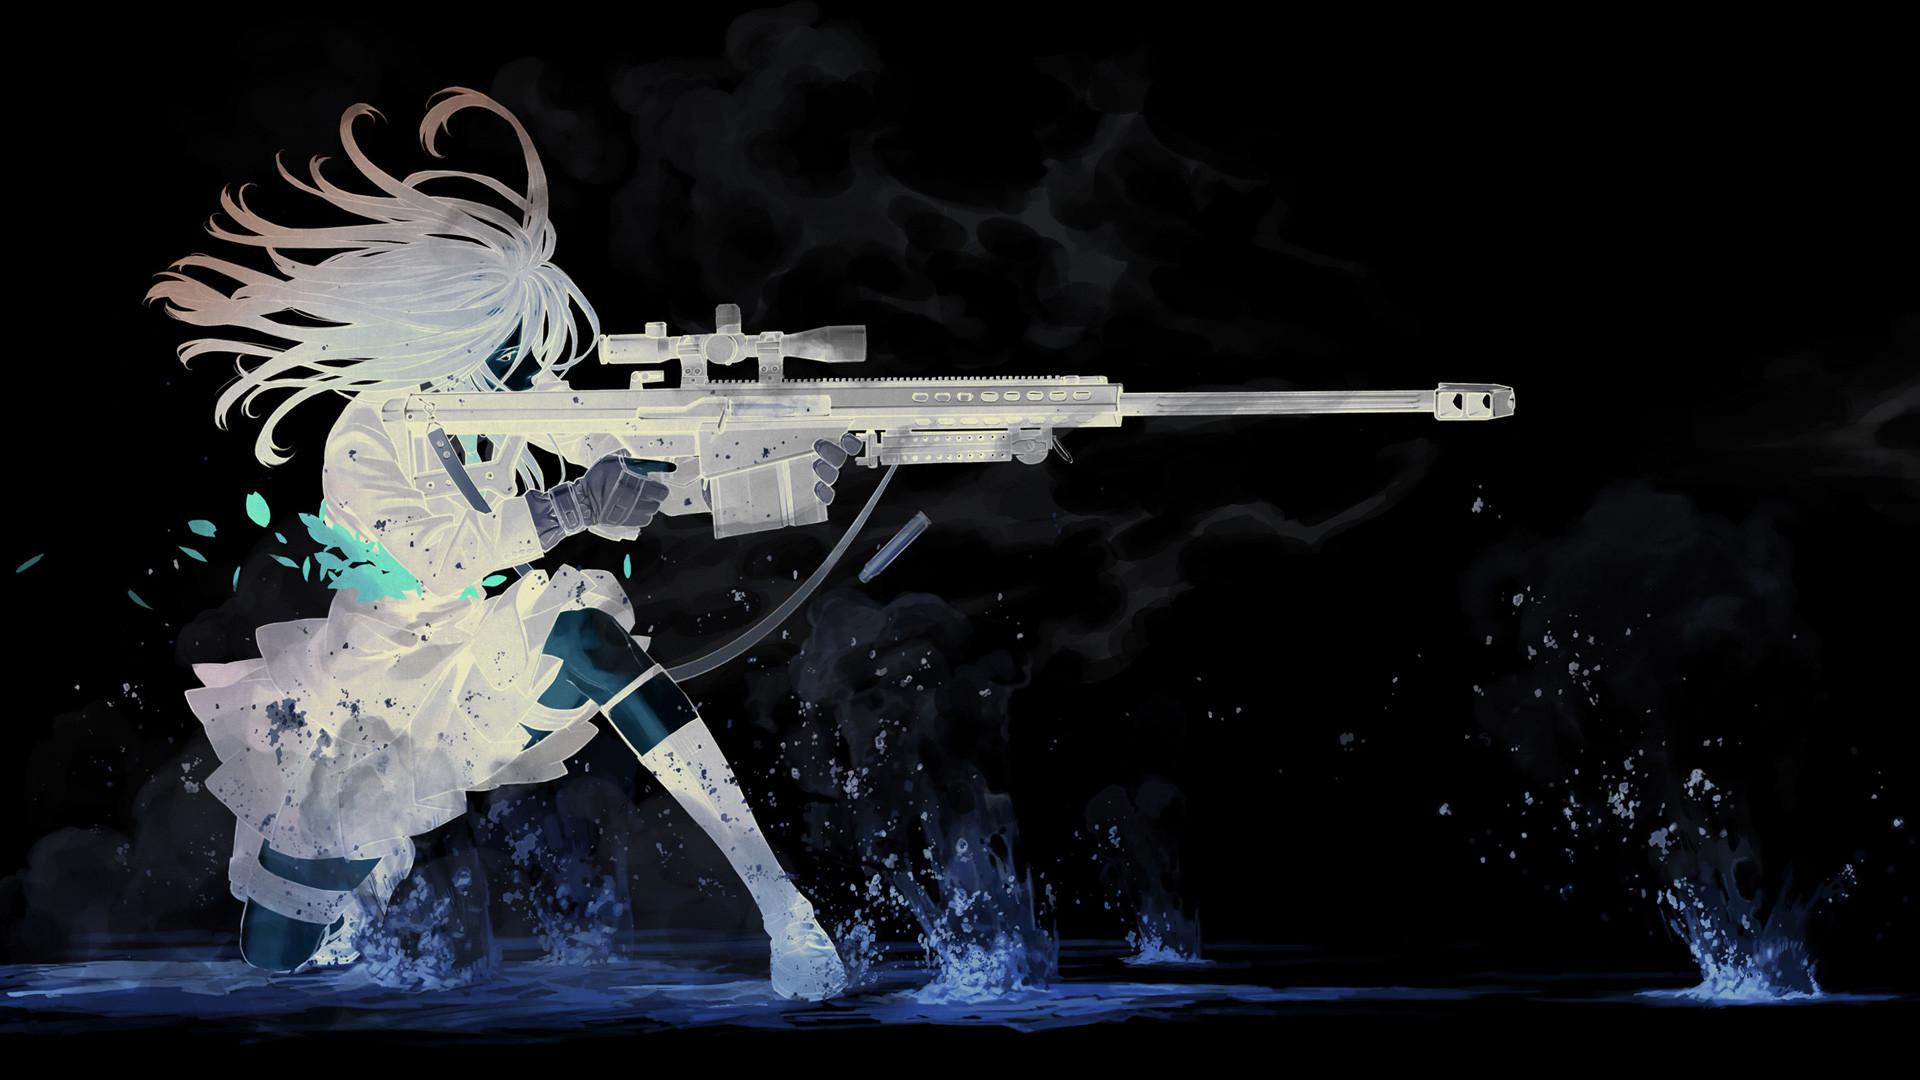 Anime chica del arma mejorada Cool Wallpaper